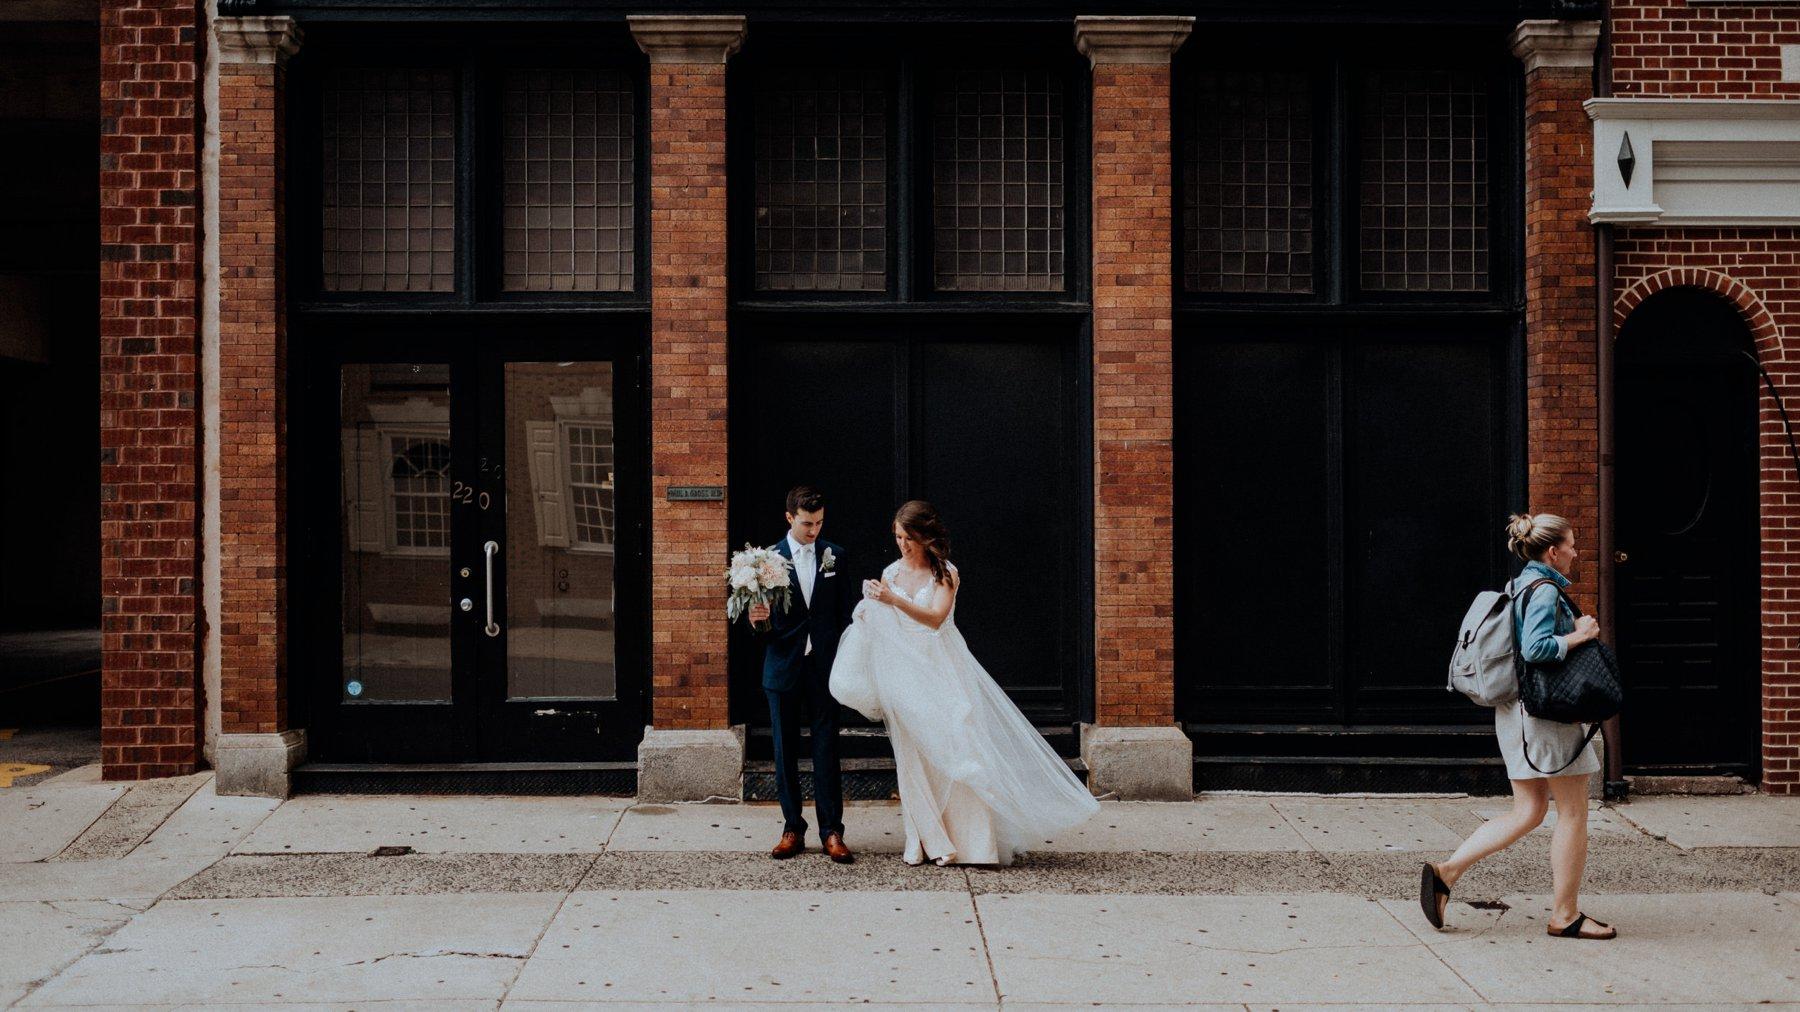 225-224-down-town-club-wedding-7.jpg